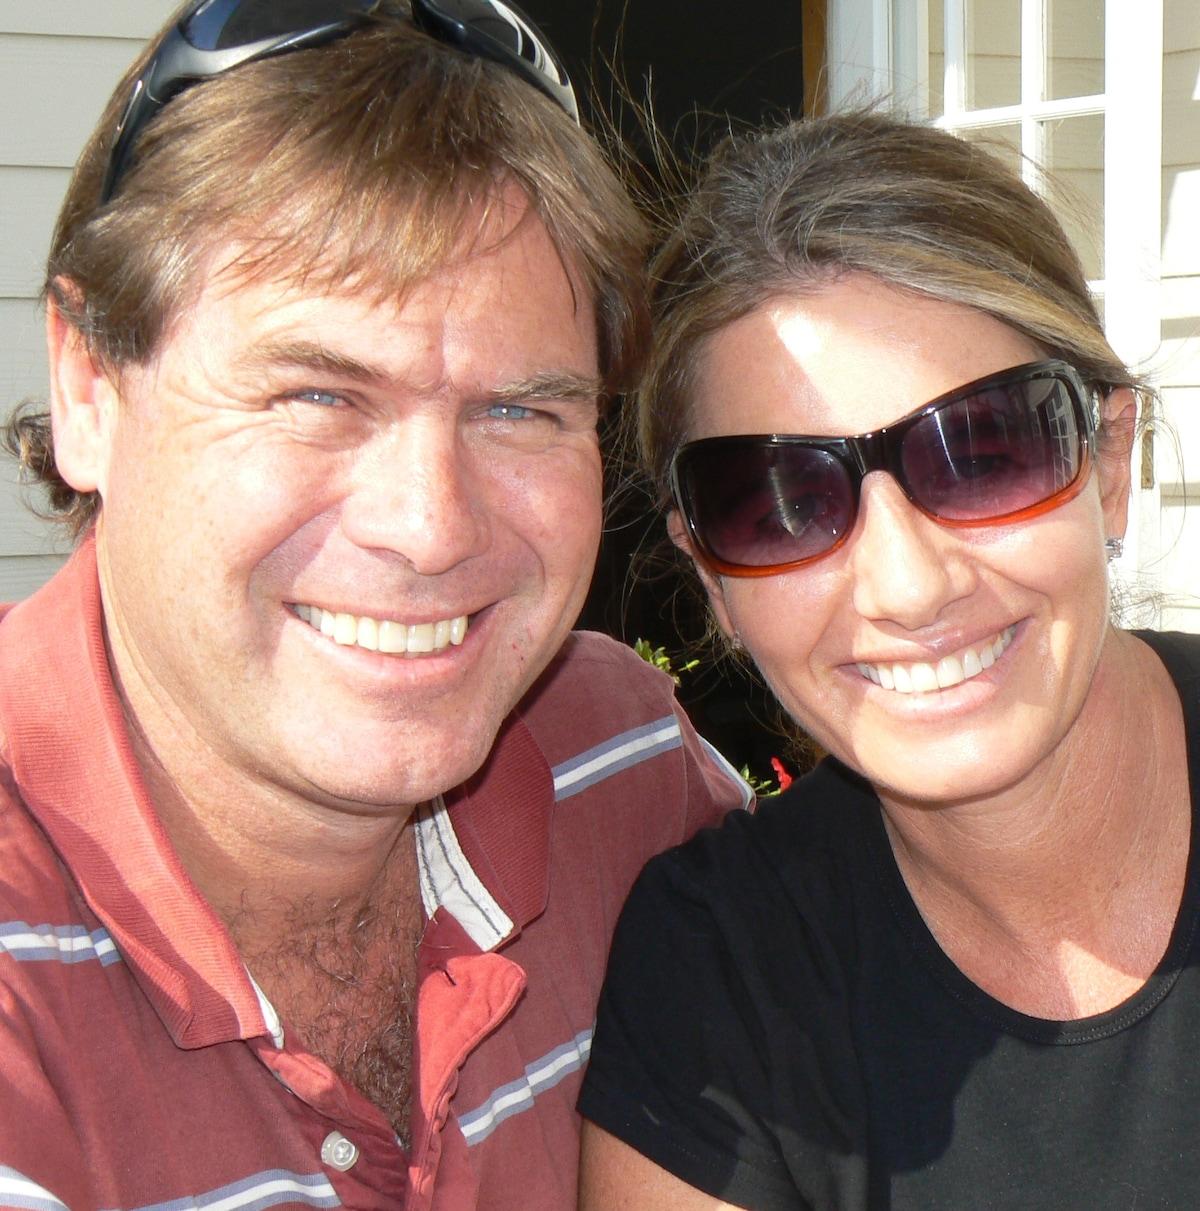 Ian & Sharon Baines from Swakopmund